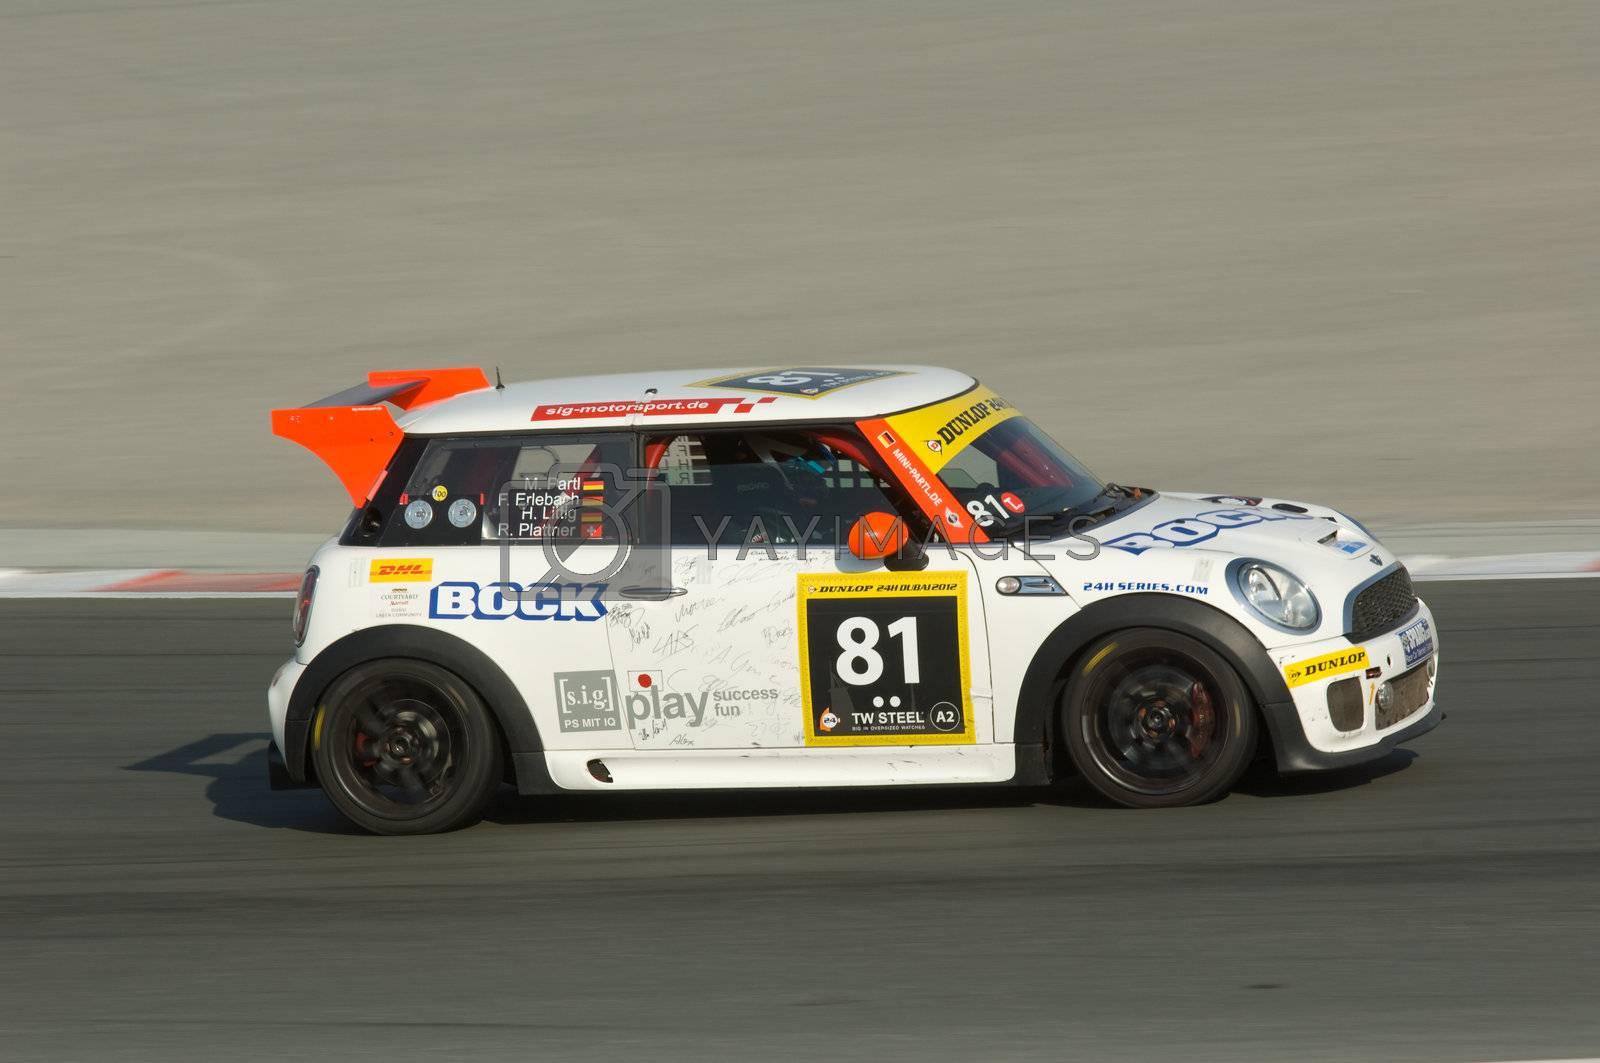 DUBAI - JANUARY 13: Car 81, a BMW Mini Cooper S, participating in the 2012 Dunlop 24 Hour Race at Dubai Autodrome on January 13, 2012.